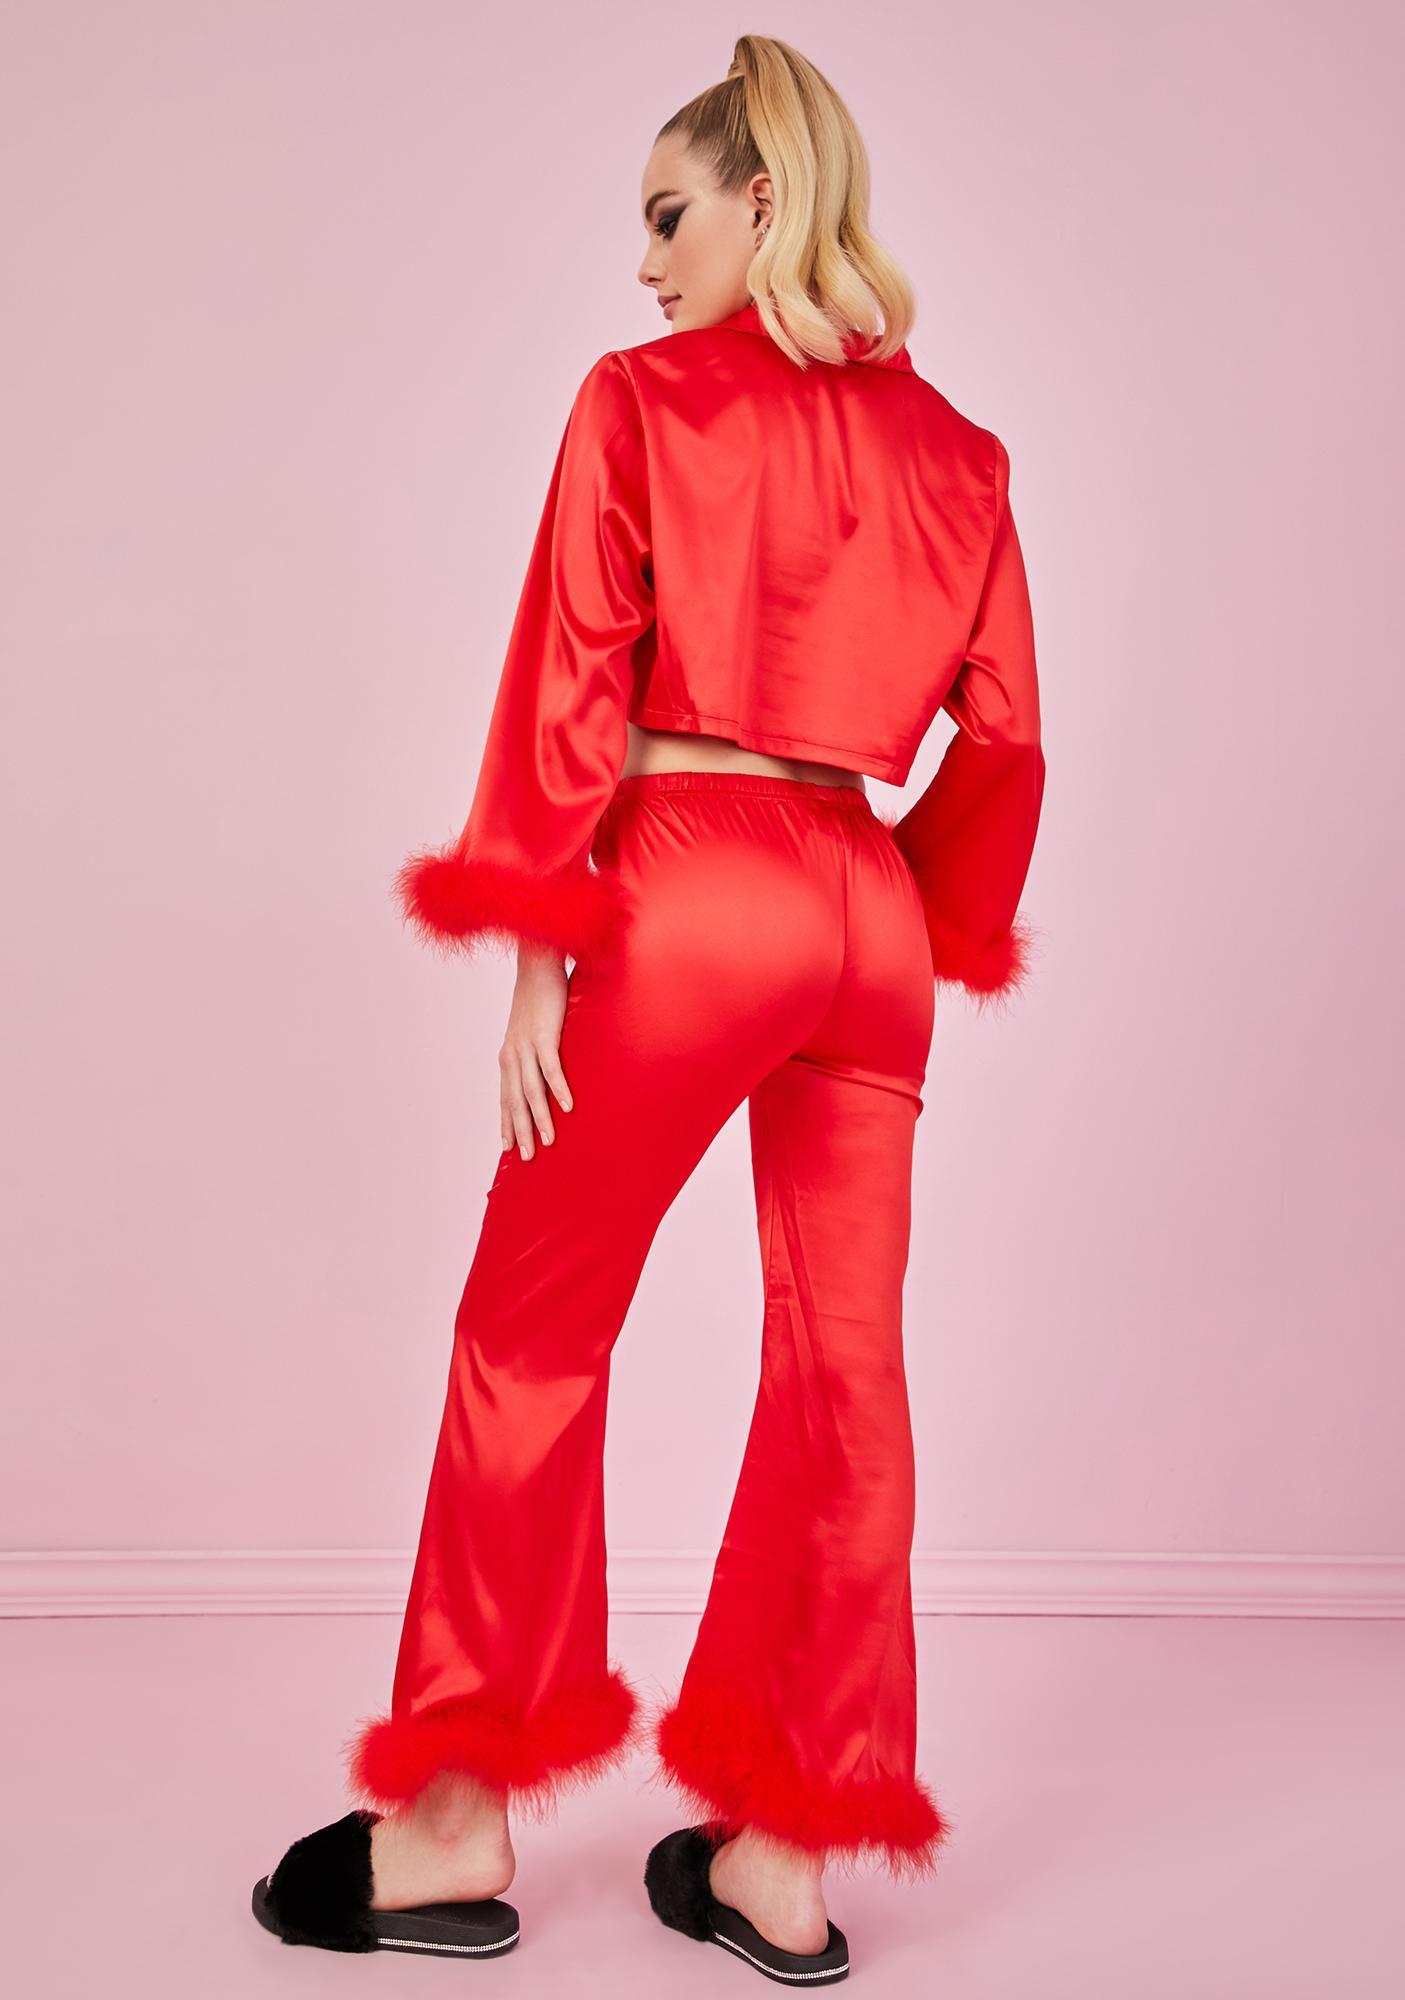 Sugar Thrillz Crimson Lover's Quarrel Satin Pajama Bottoms